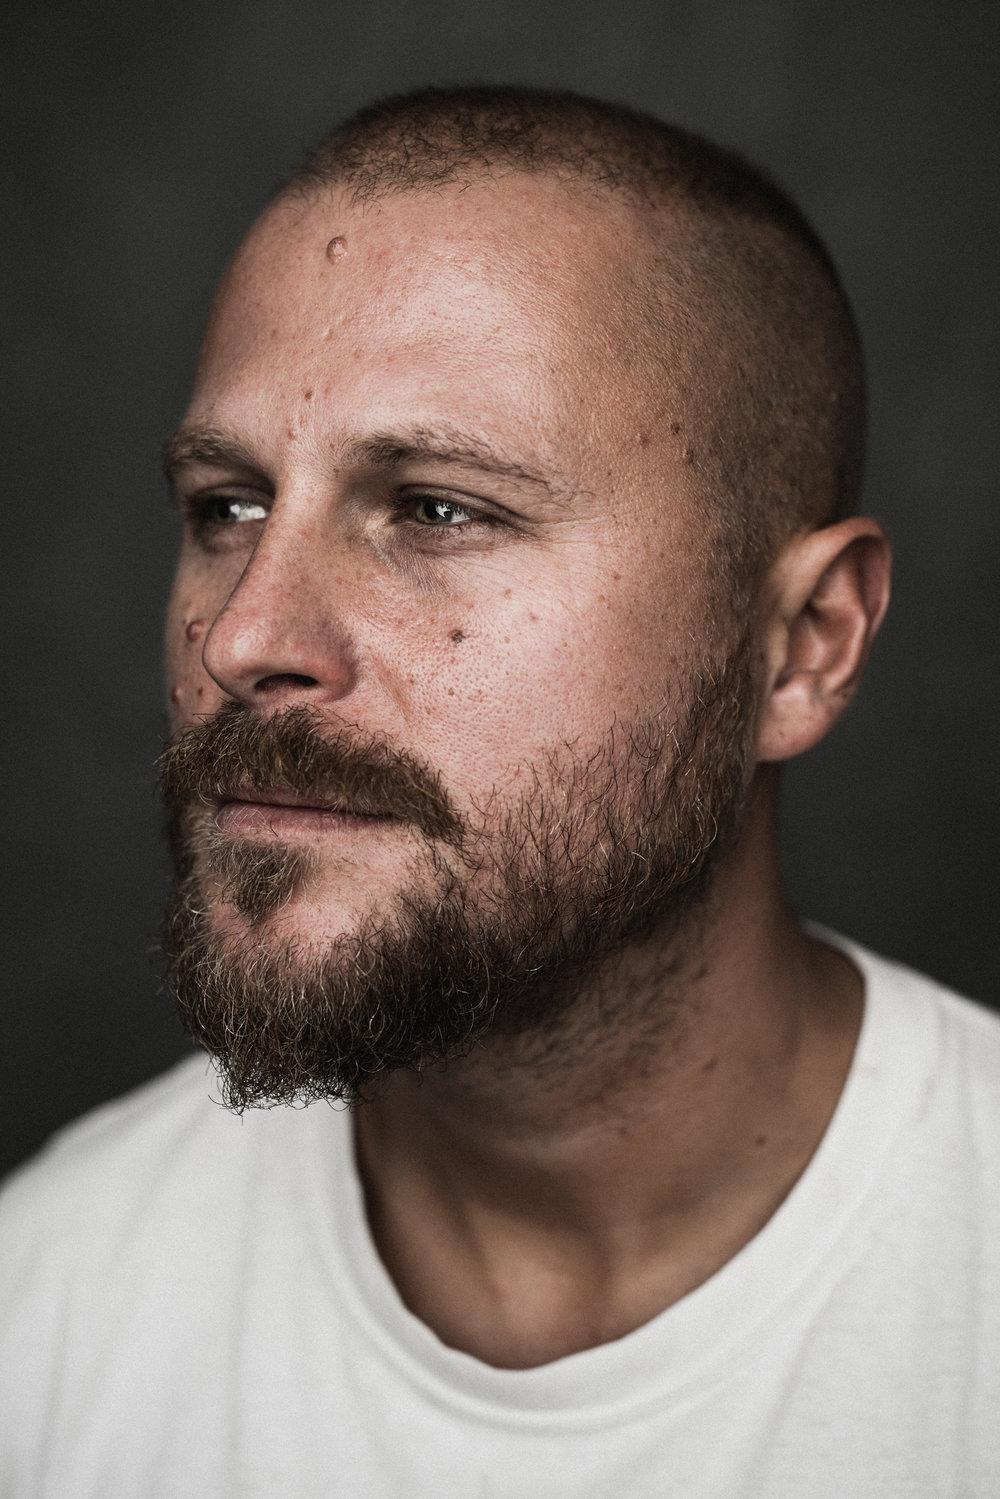 Mirko Markic People Photographer Augsburg